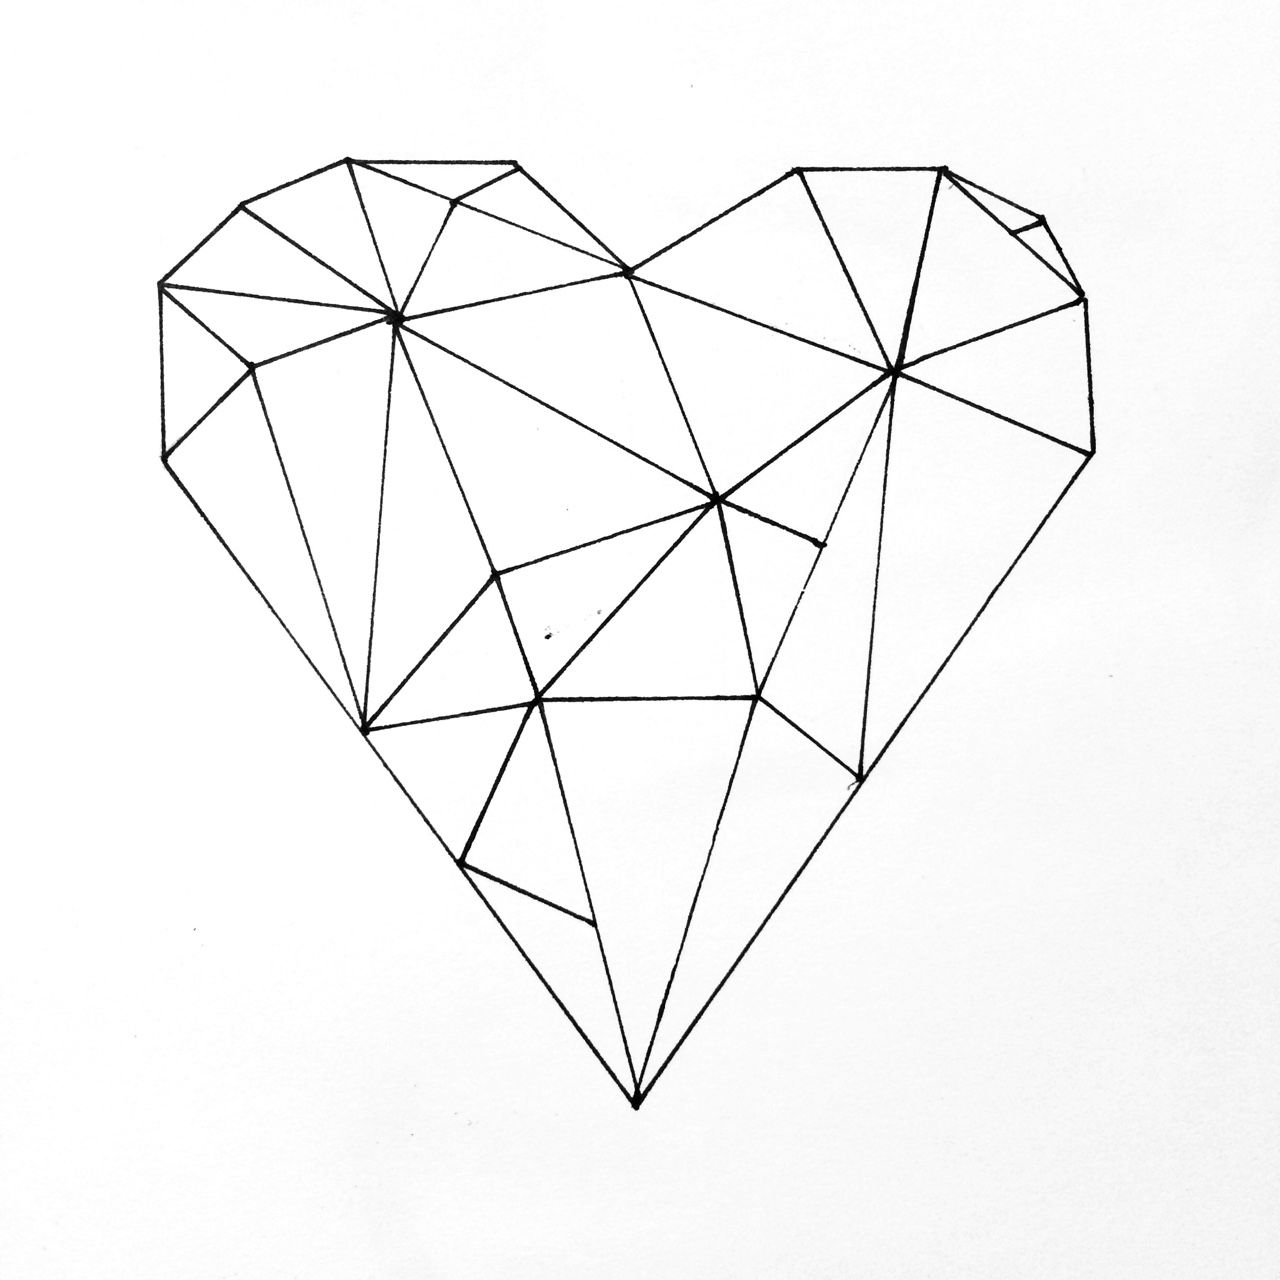 Line Art Picsart : Pin by on Рисунки для скетчбука pinterest drawings